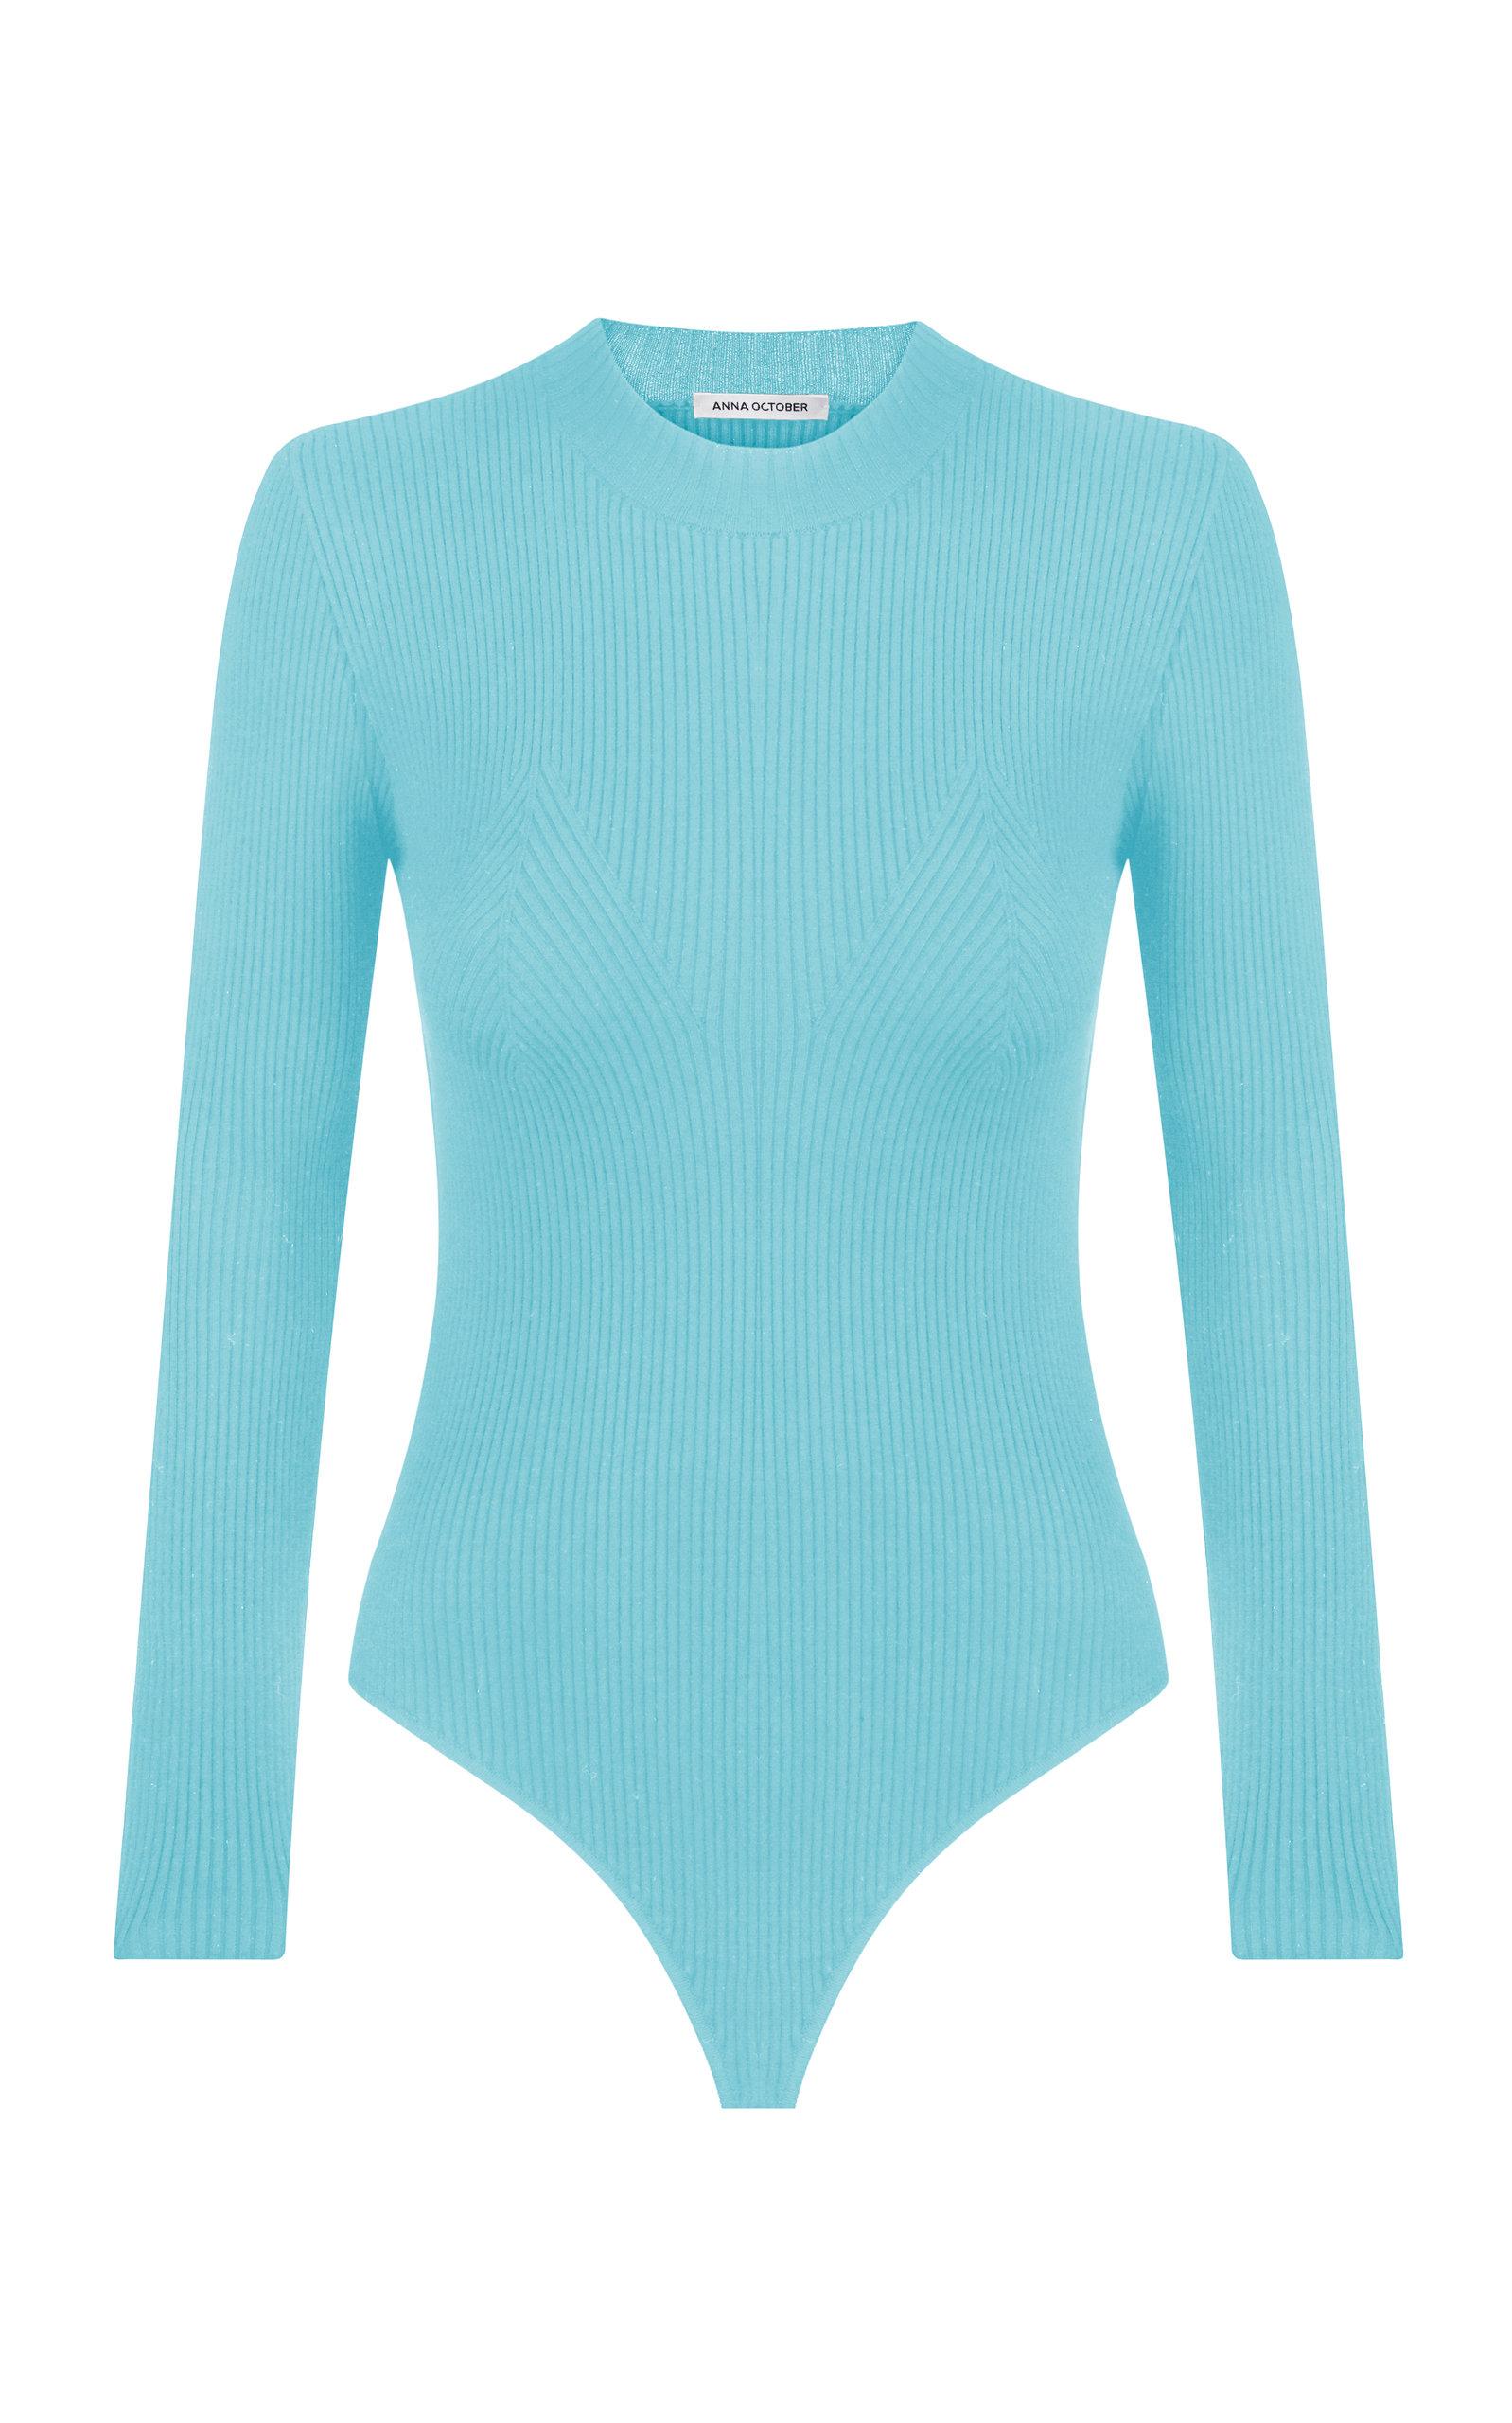 Women's Sveta Open Back Jersey Bodysuit